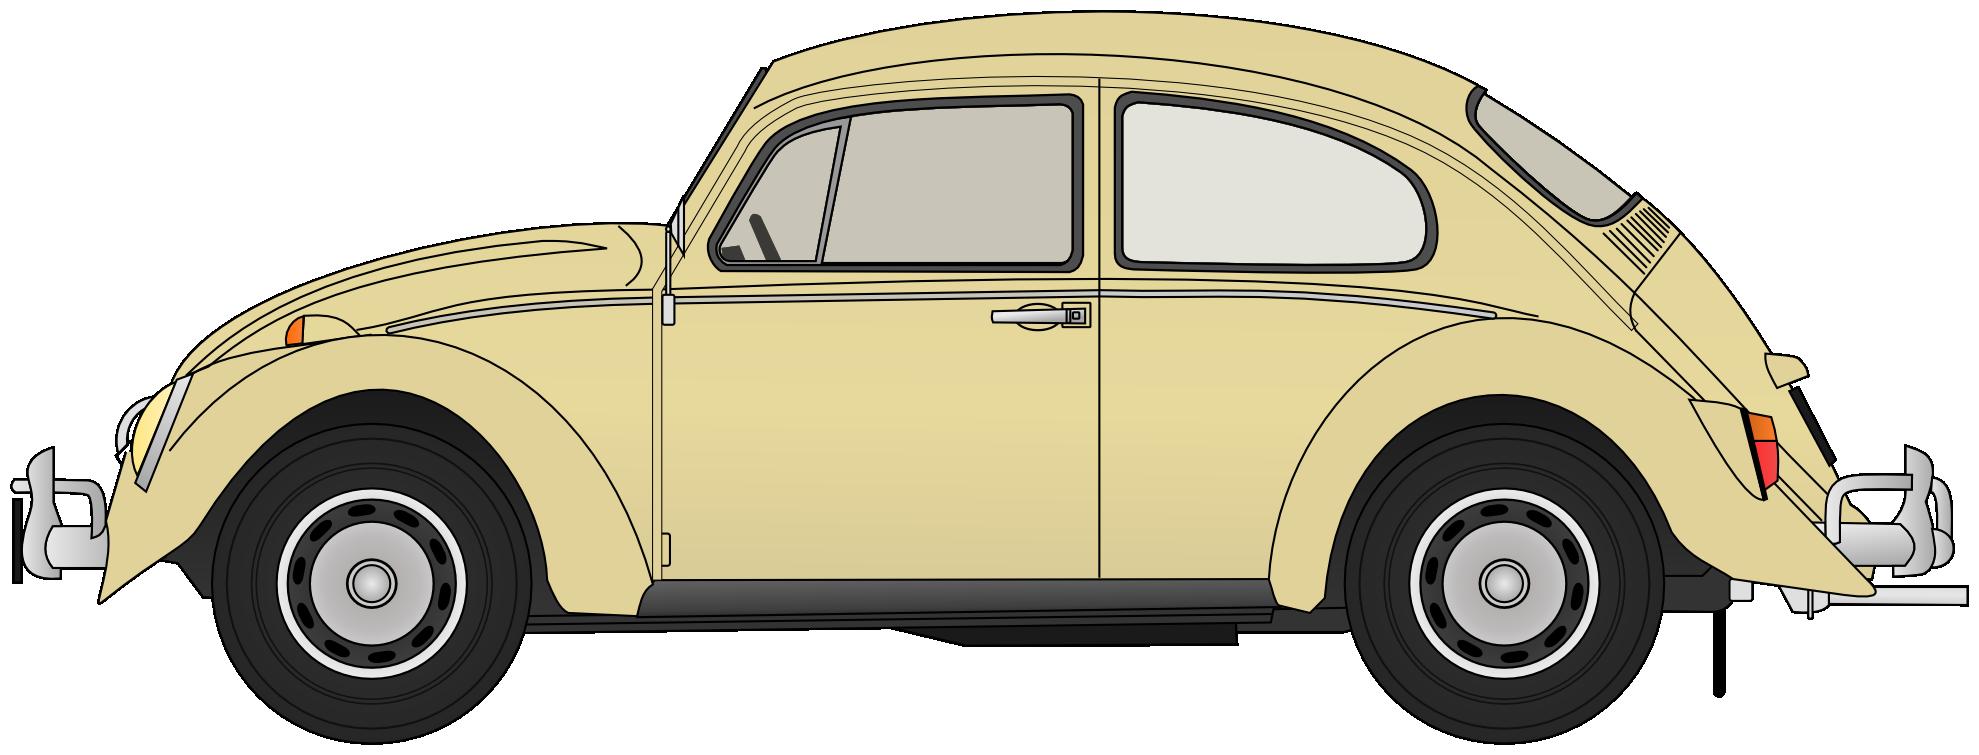 Vw Beetle Clipart.